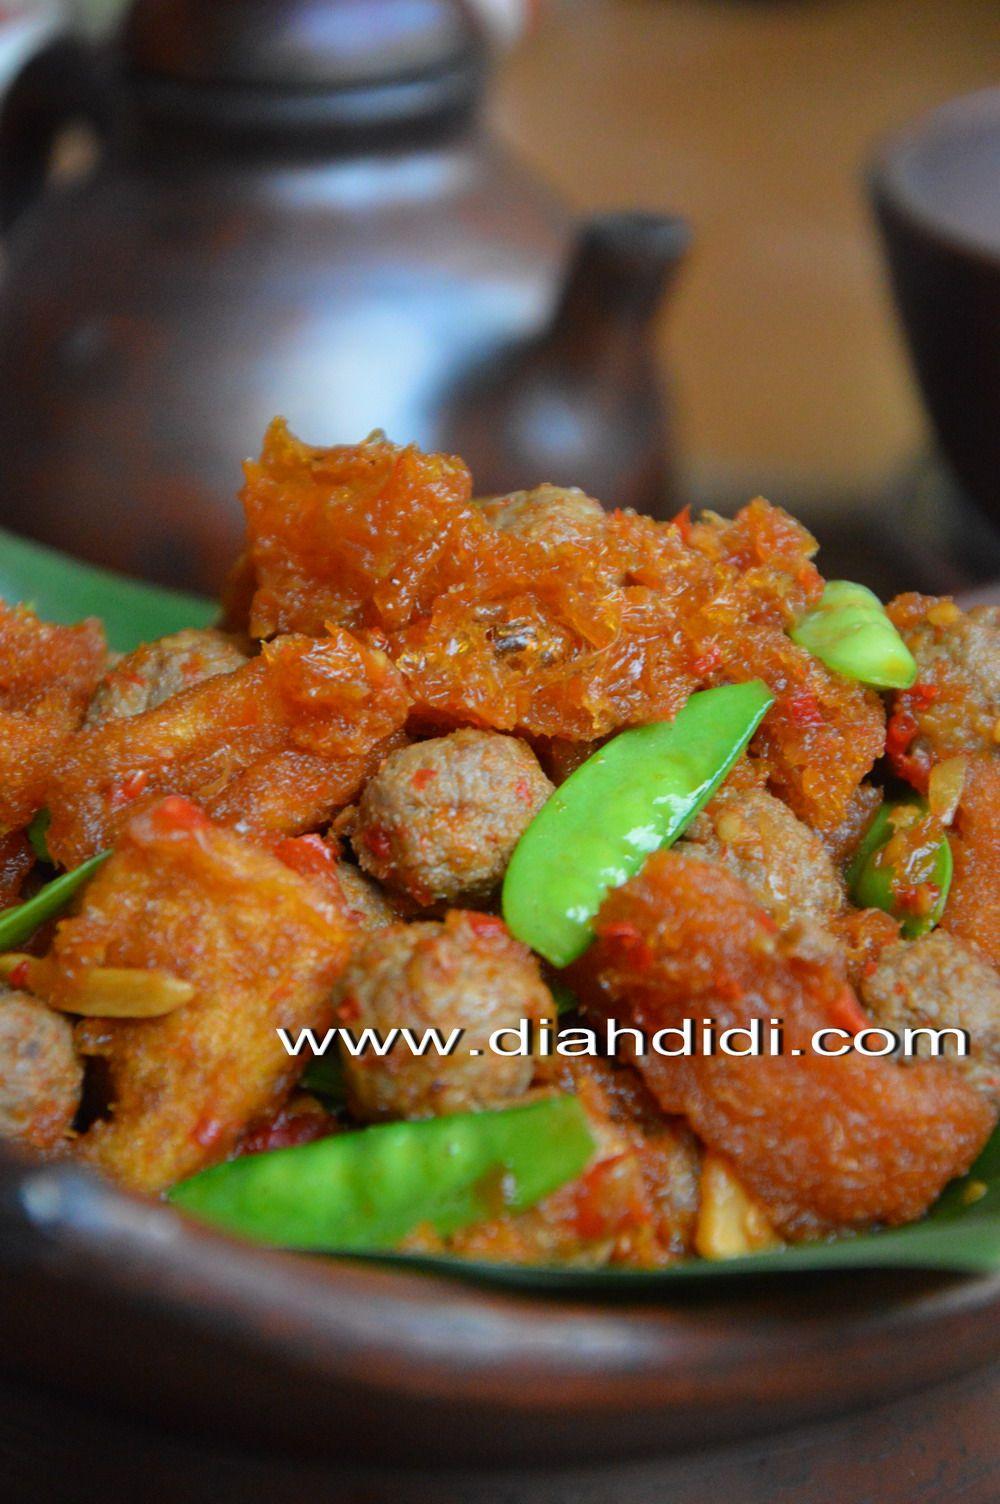 Inspirasi Menu Buka Puasa Hari Ke 26 Menu Lebaran Sambel Goreng Kreni Yogya Resep Makanan Cina Resep Masakan Resep Masakan Indonesia